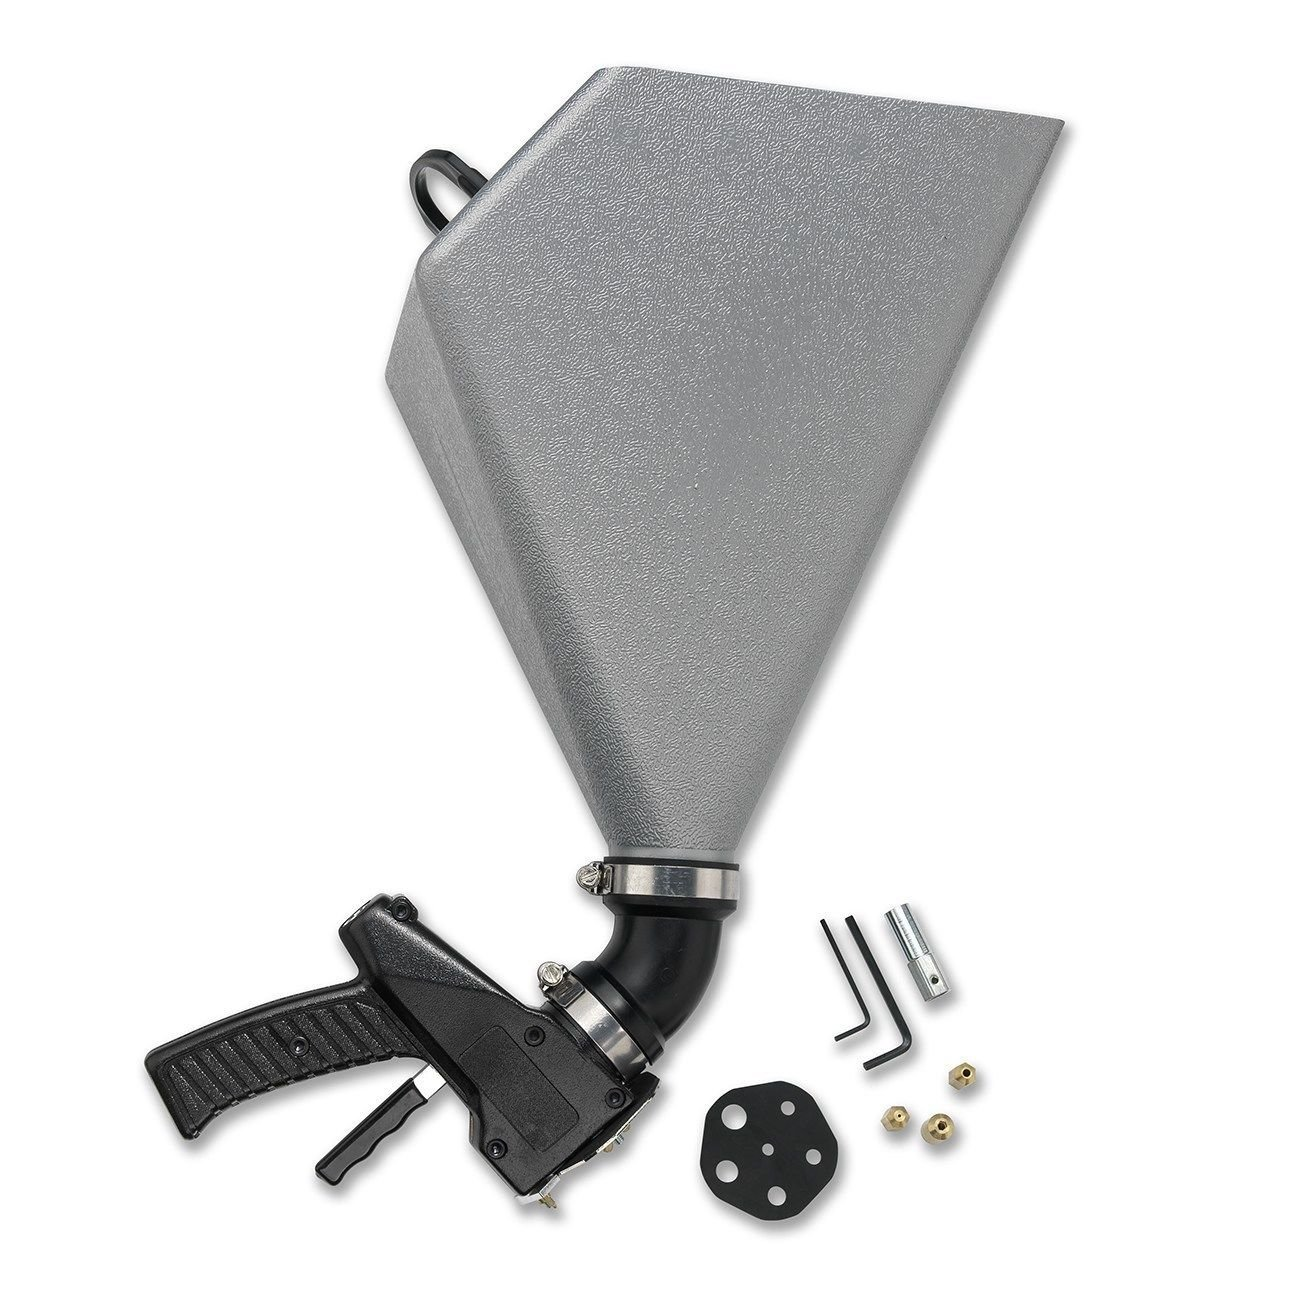 Car Paint Tool Air Texture Hopper Gun Spray Pistol Drywall Painting Tools Pro Pneumatic Durable Plastic - Skroutz by Skroutz (Image #2)